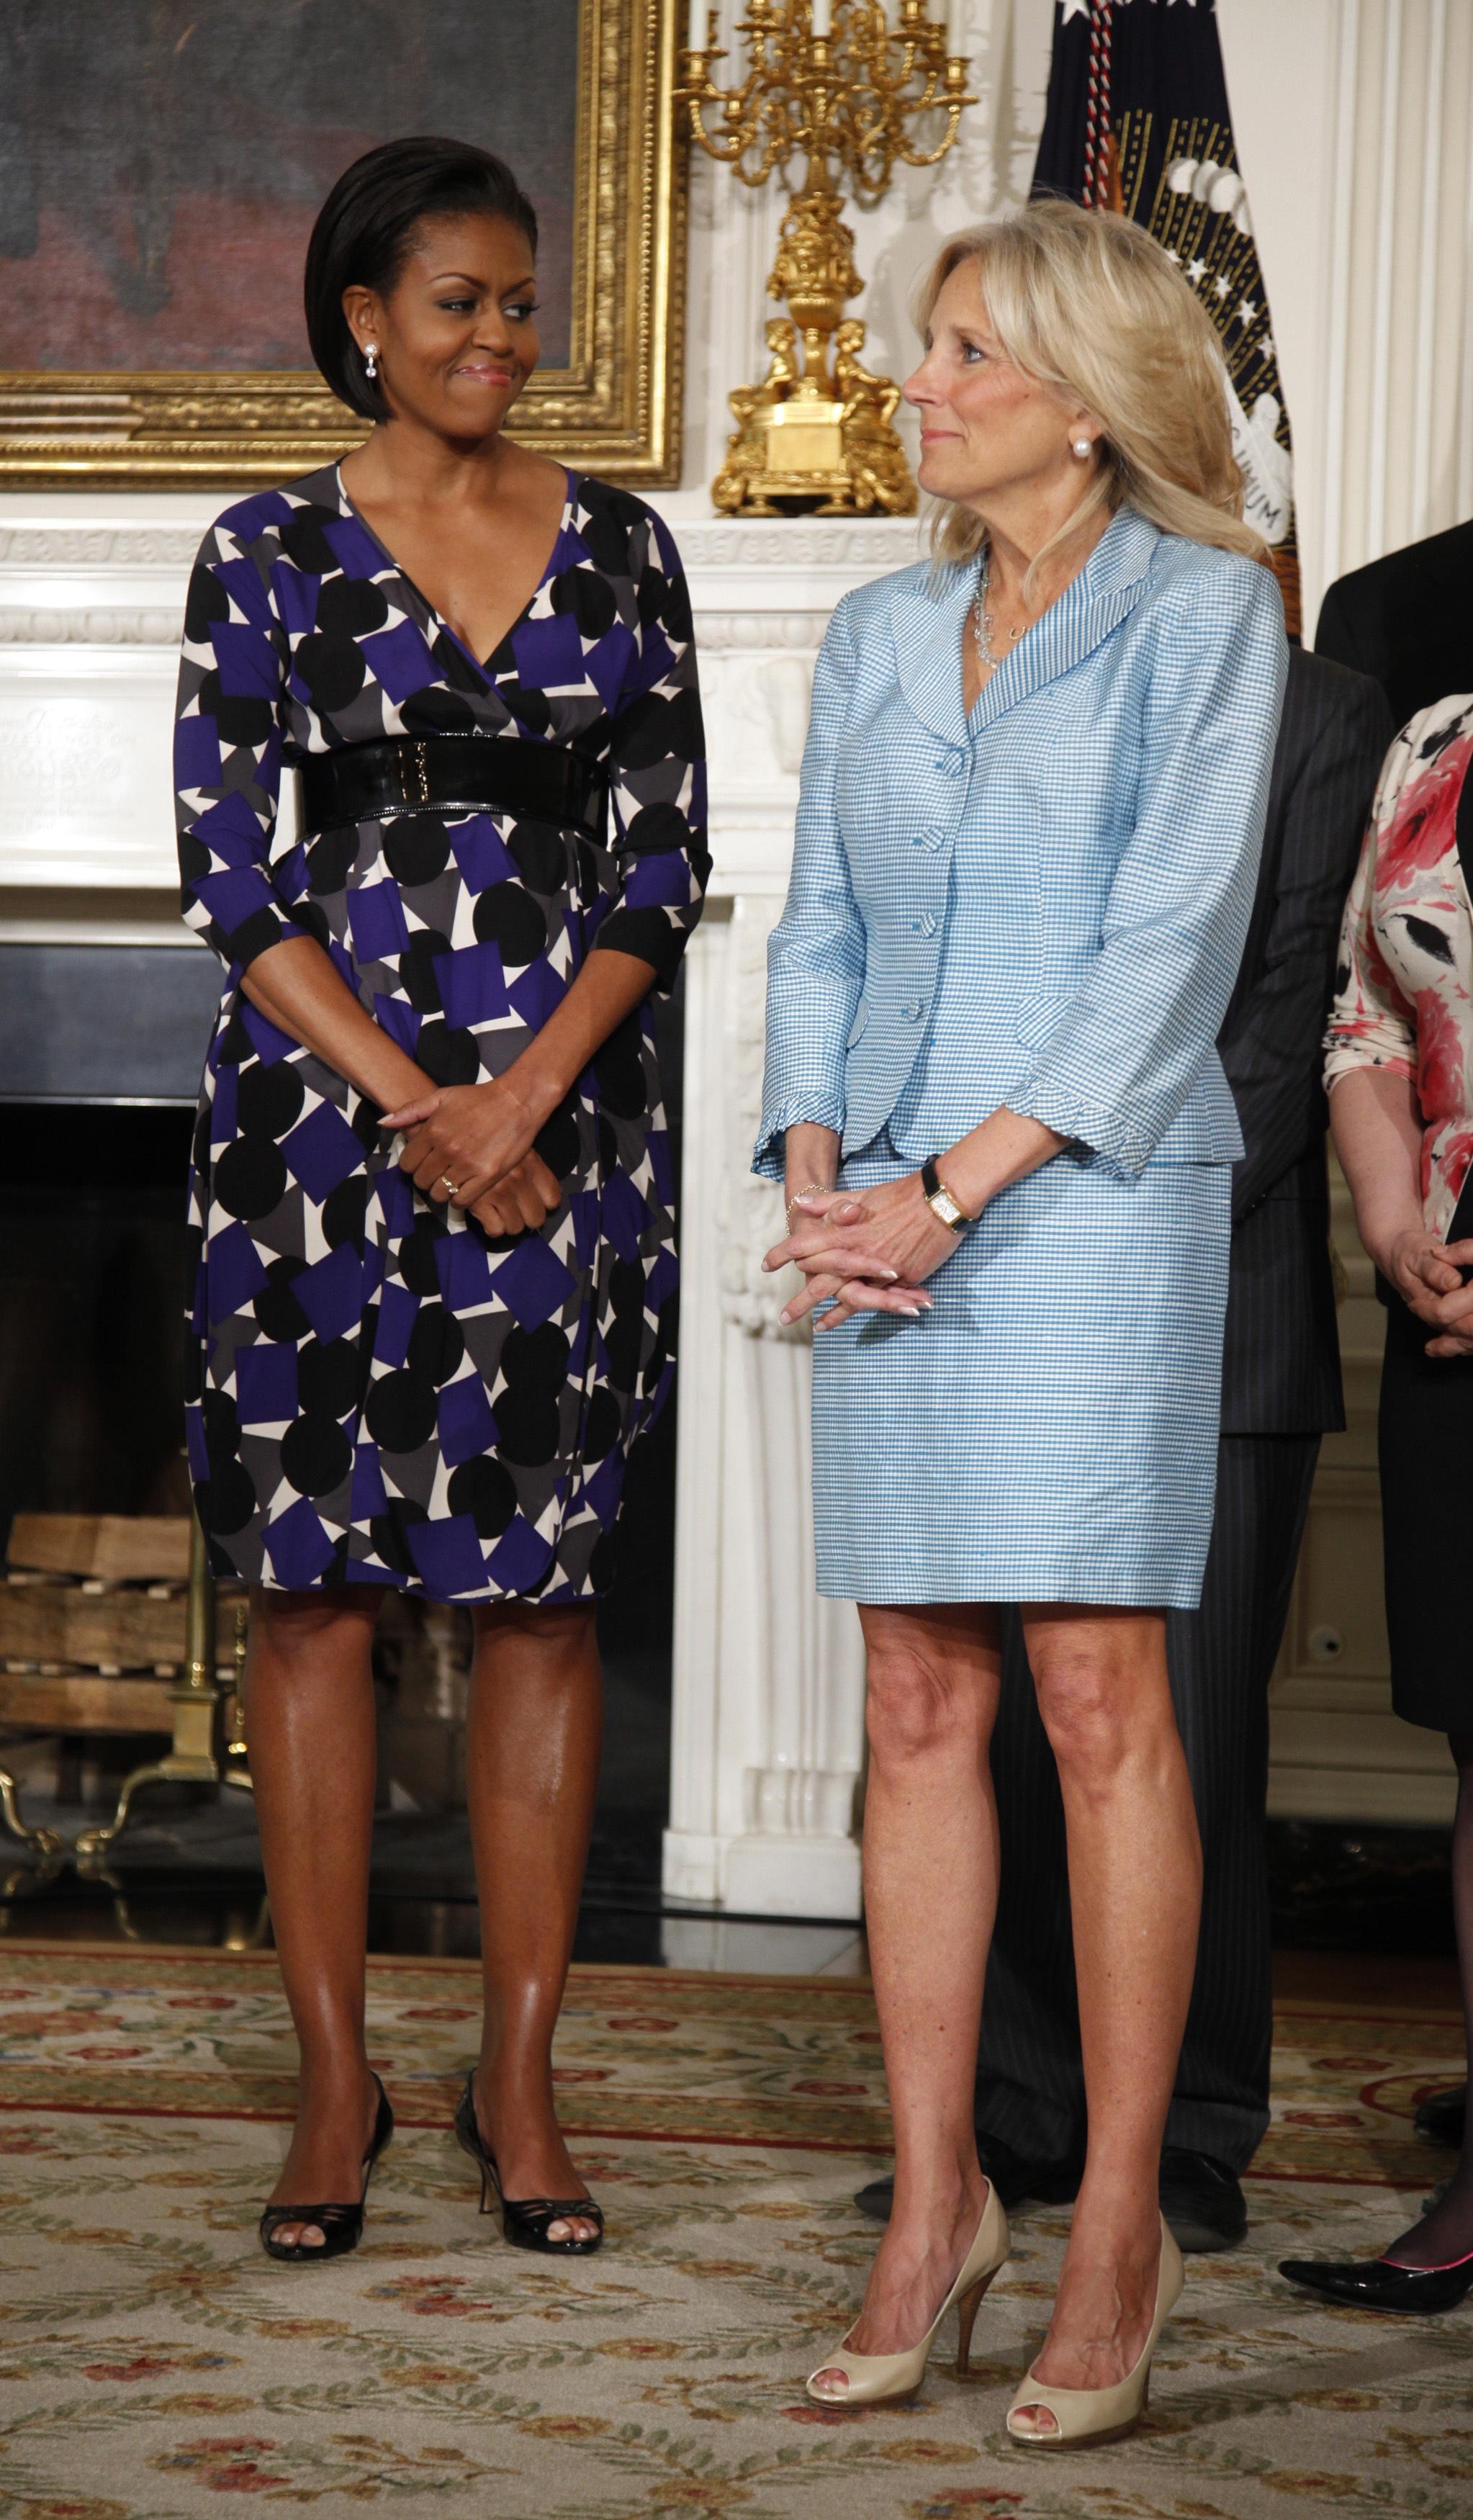 Congratulate, what pretty michelle obama feet consider, that